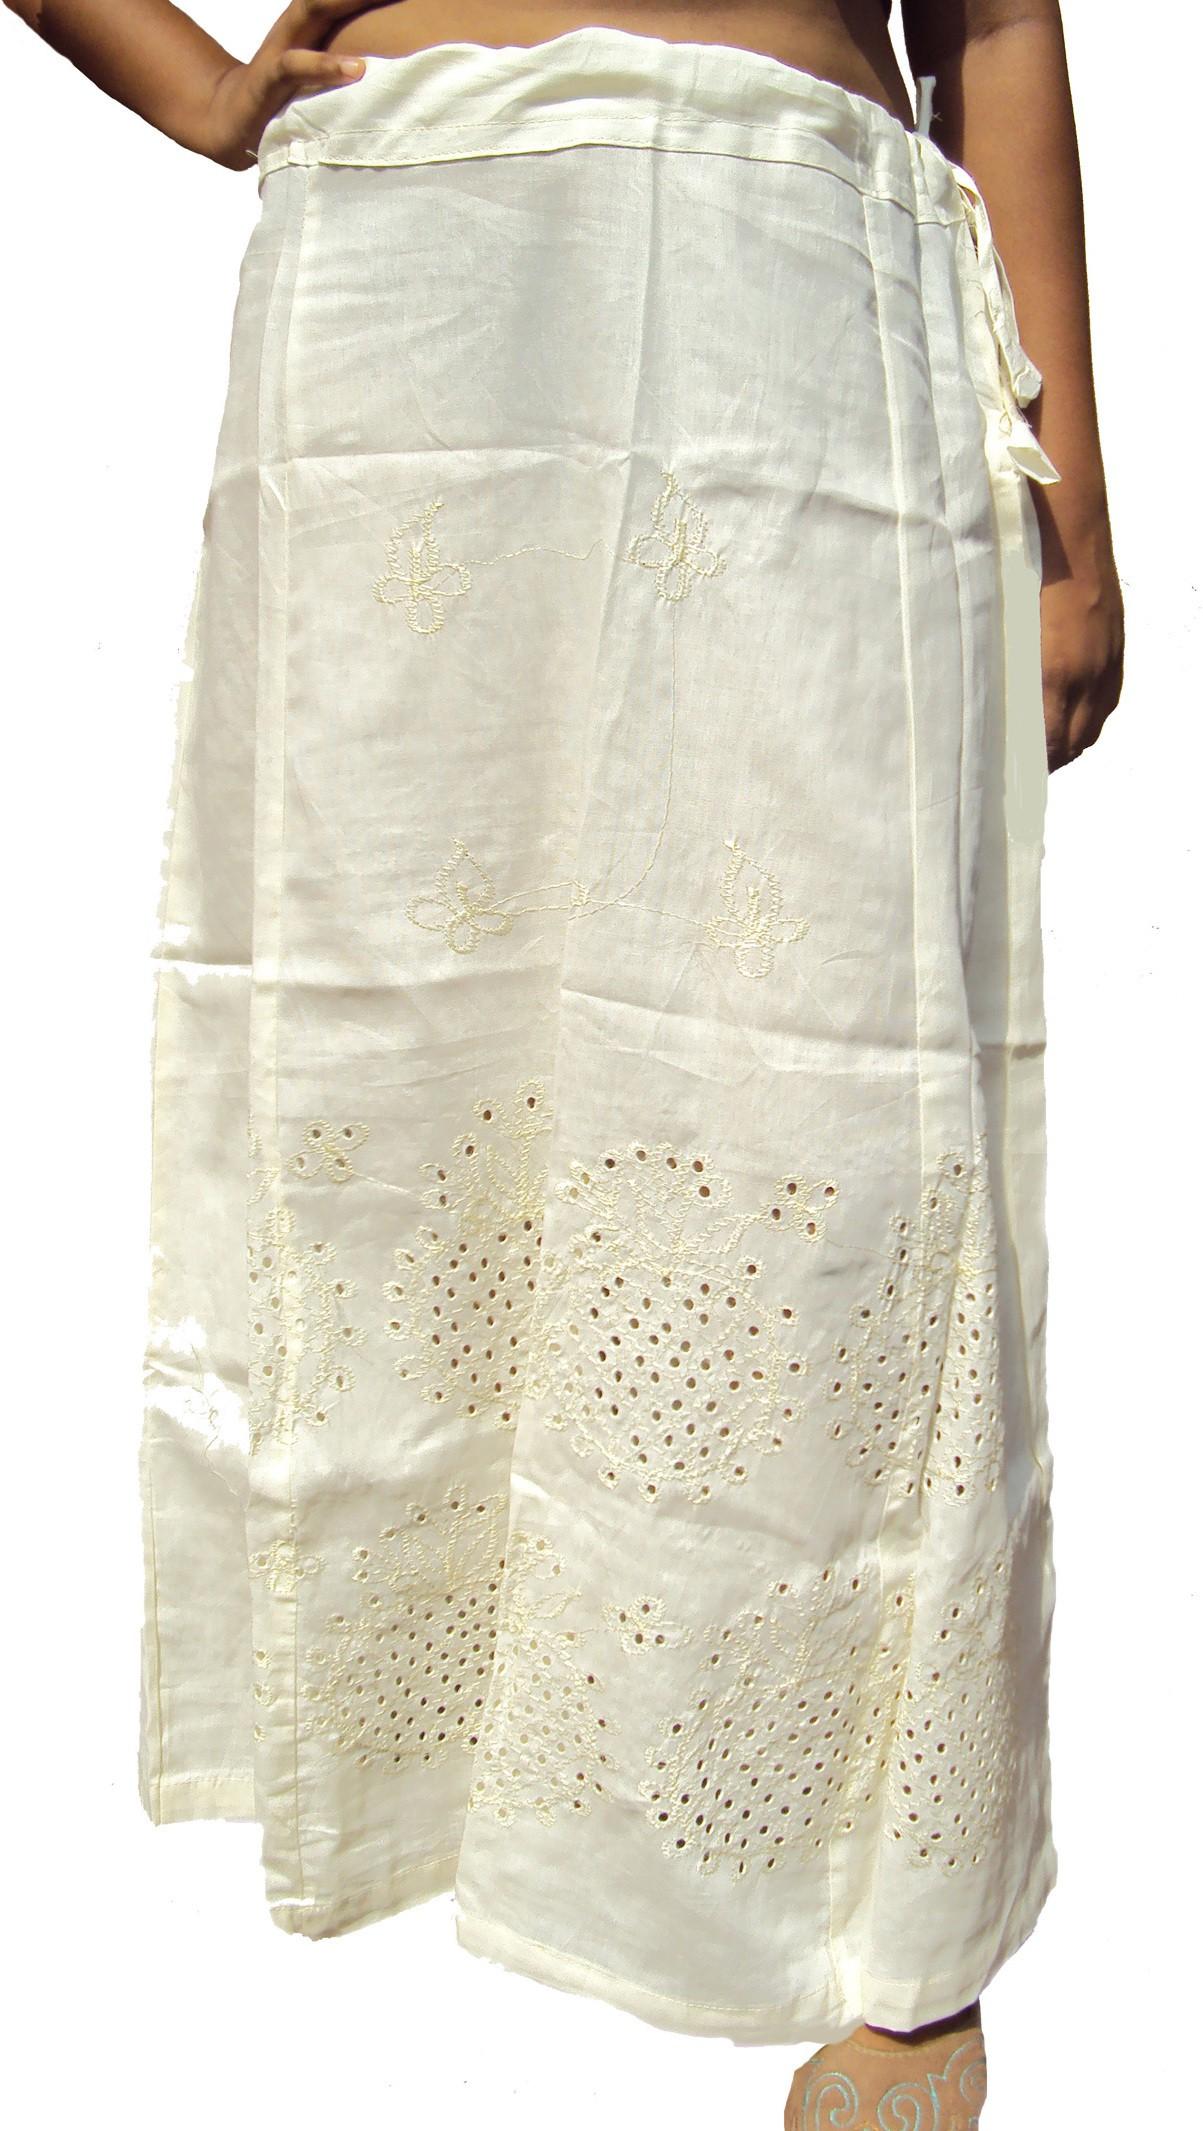 New Life Enterprise Hath0710-Cream Cotton Petticoat(XXL)